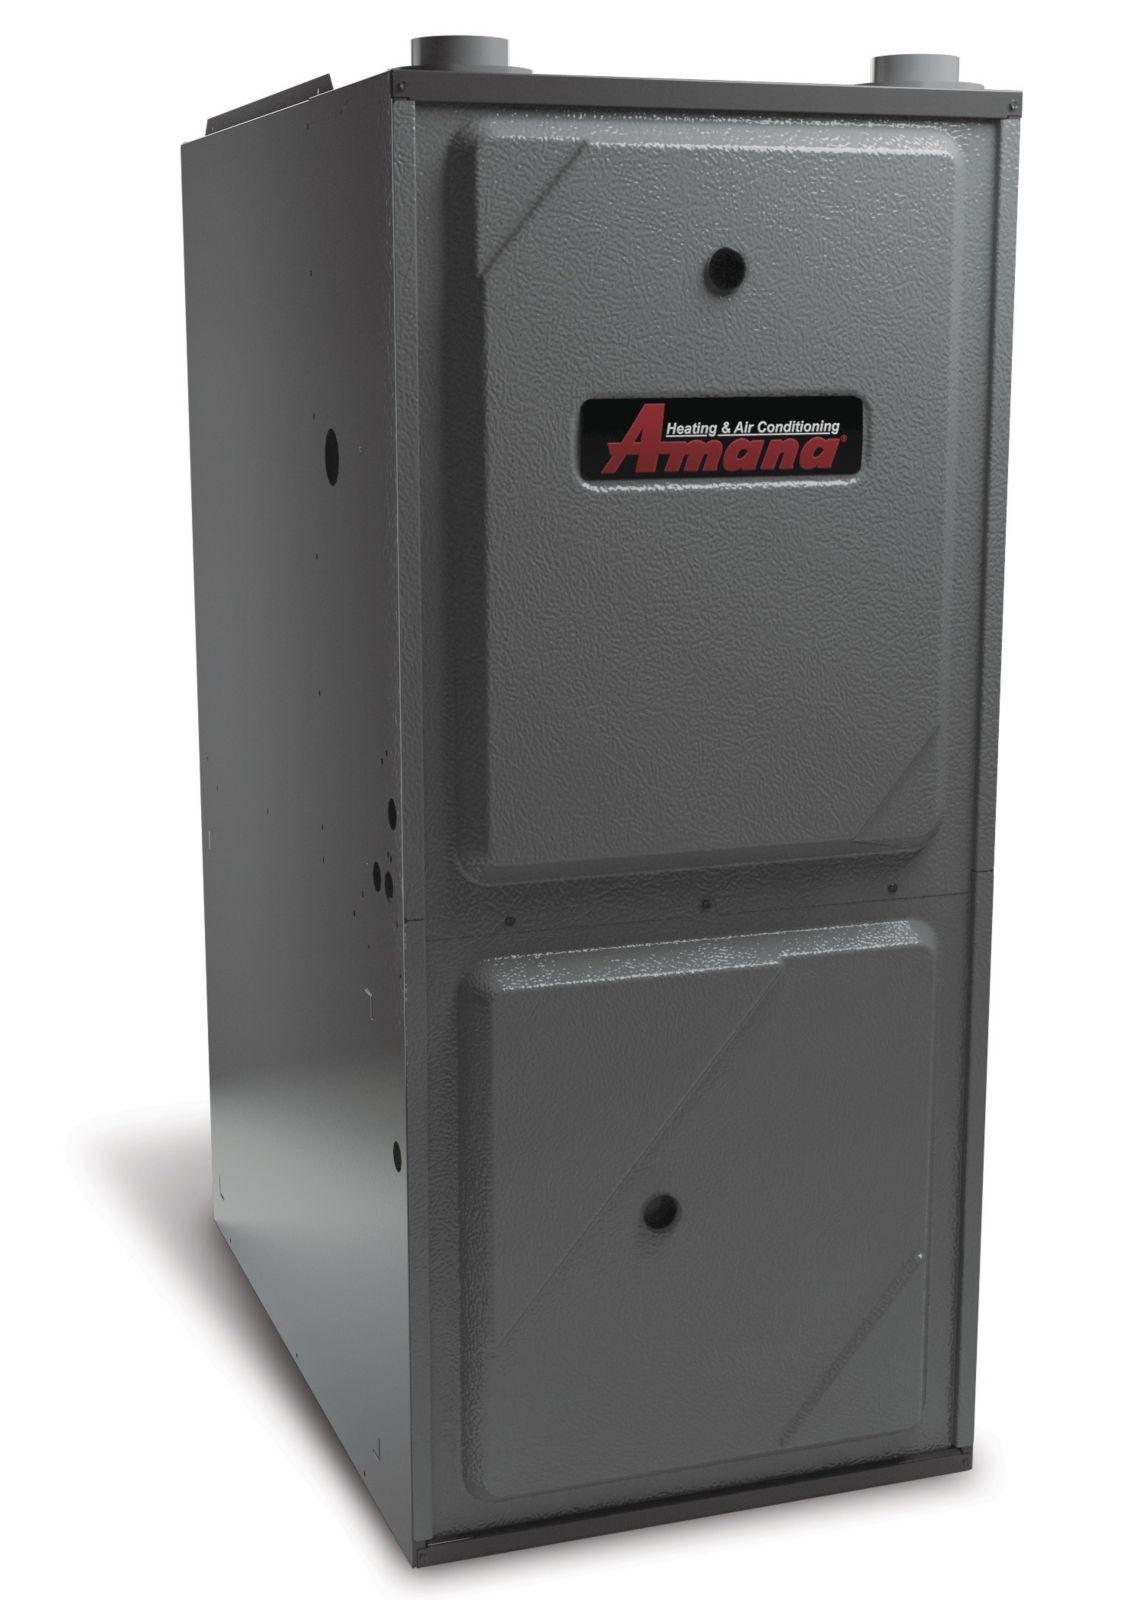 Amana Amvm Series Gas Furnace 97 Afue 80k Btu 2 Stage Wiring Diagram Upflow Horizontal 1200 Cfm 17 1 Cabinet